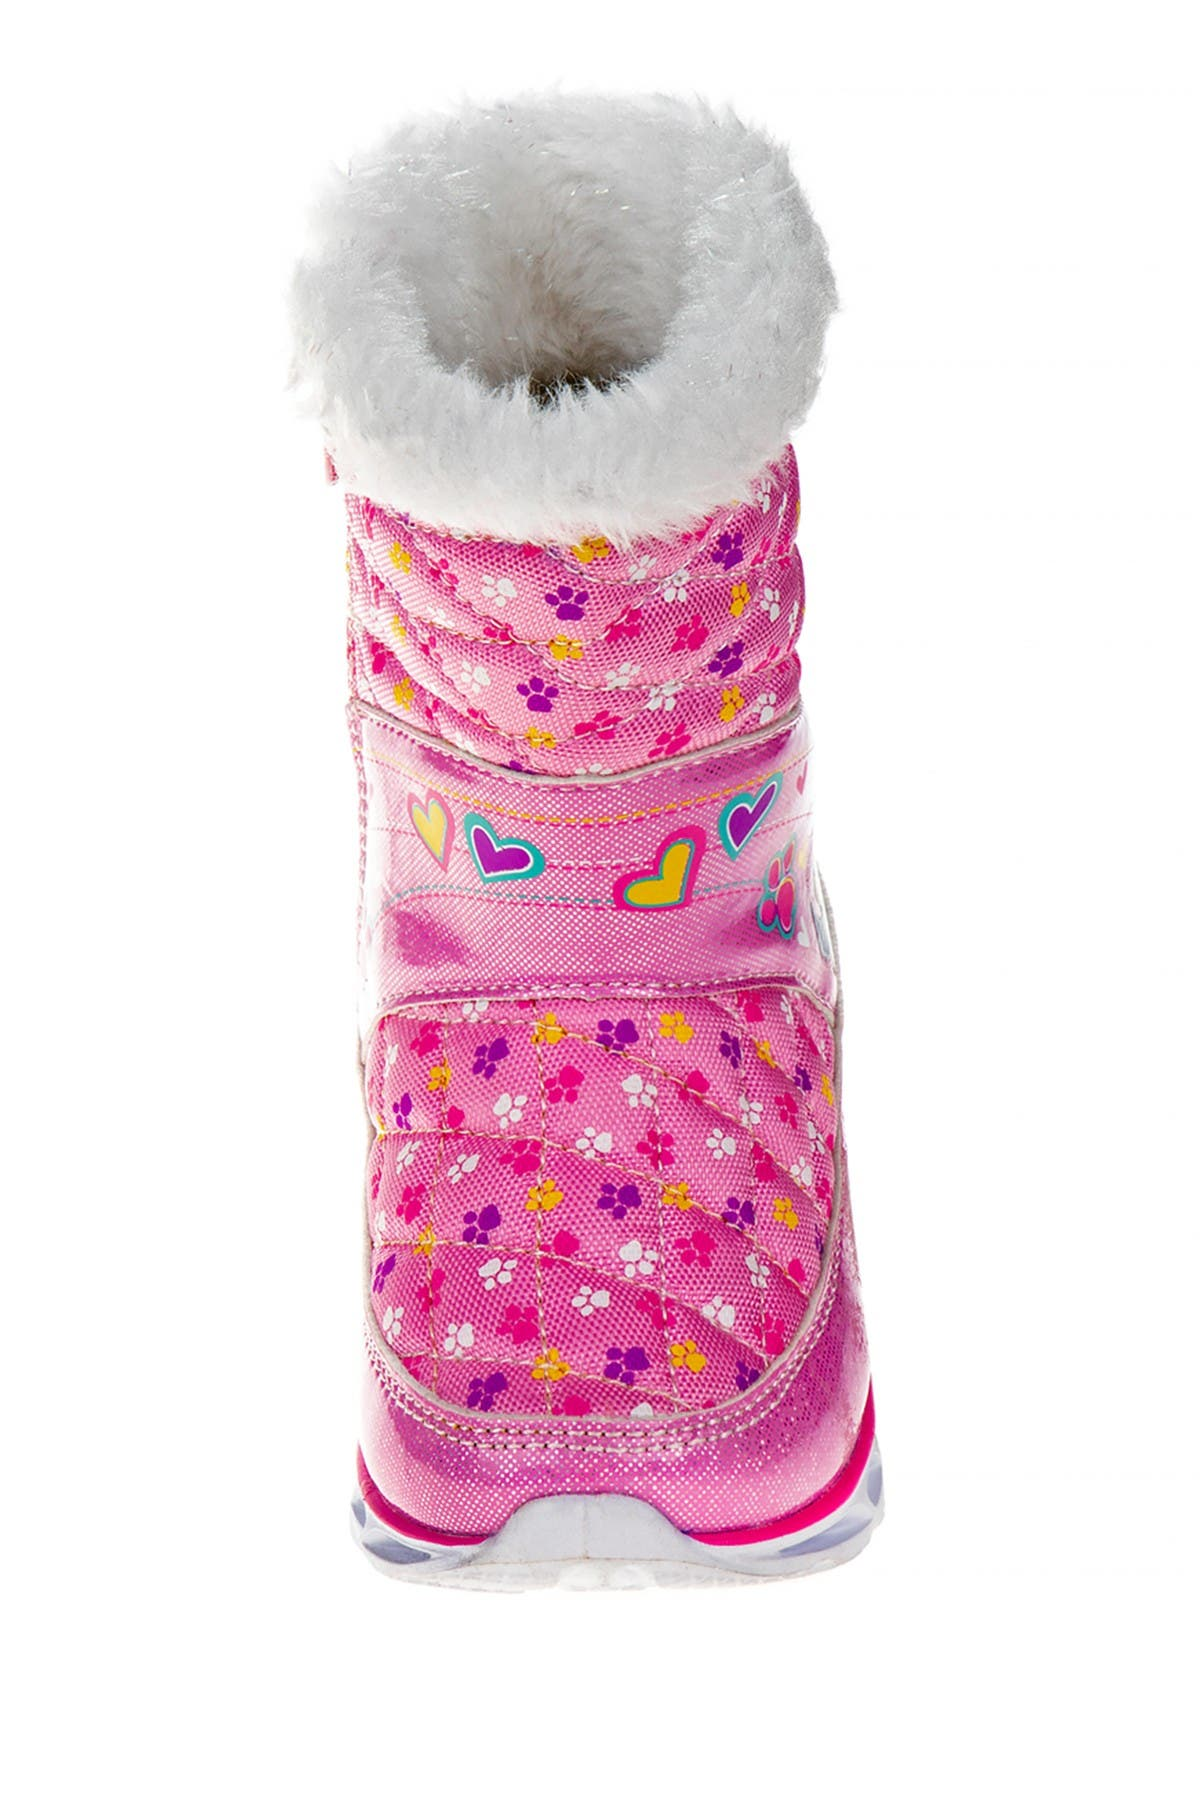 Josmo Paw Patrol Light-Up Faux Fur Snowboots